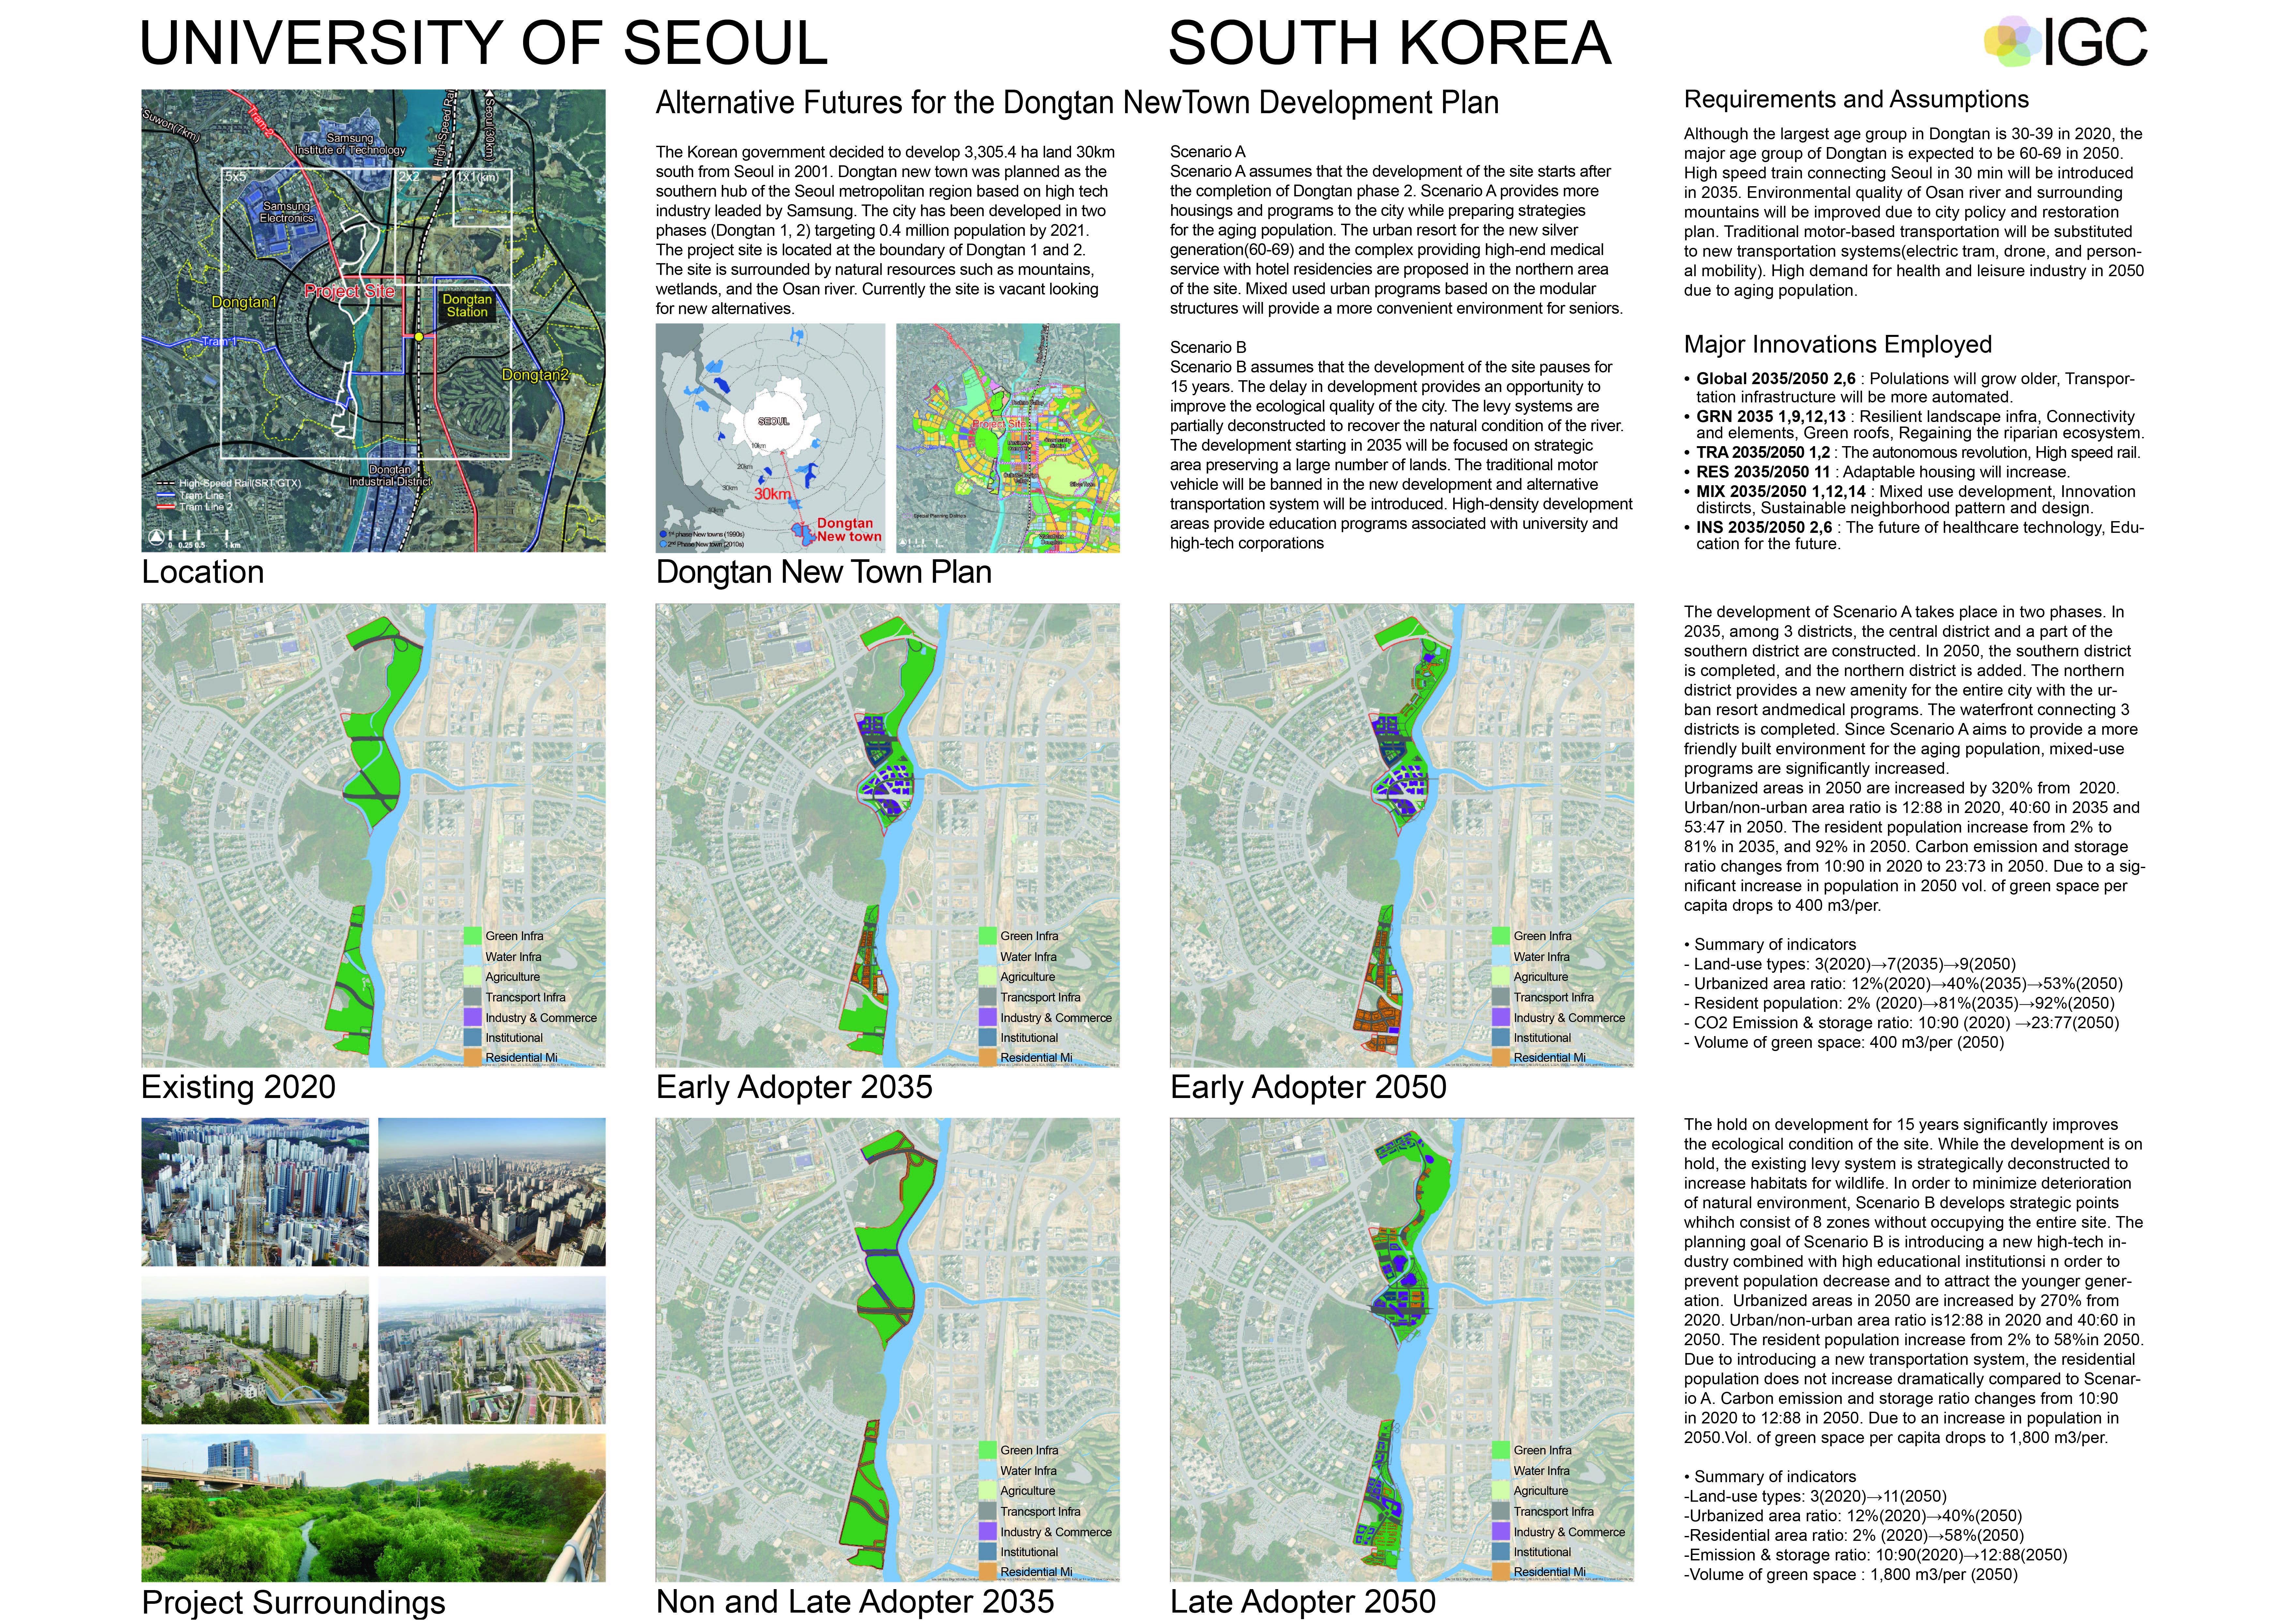 19_University of Seoul_revised